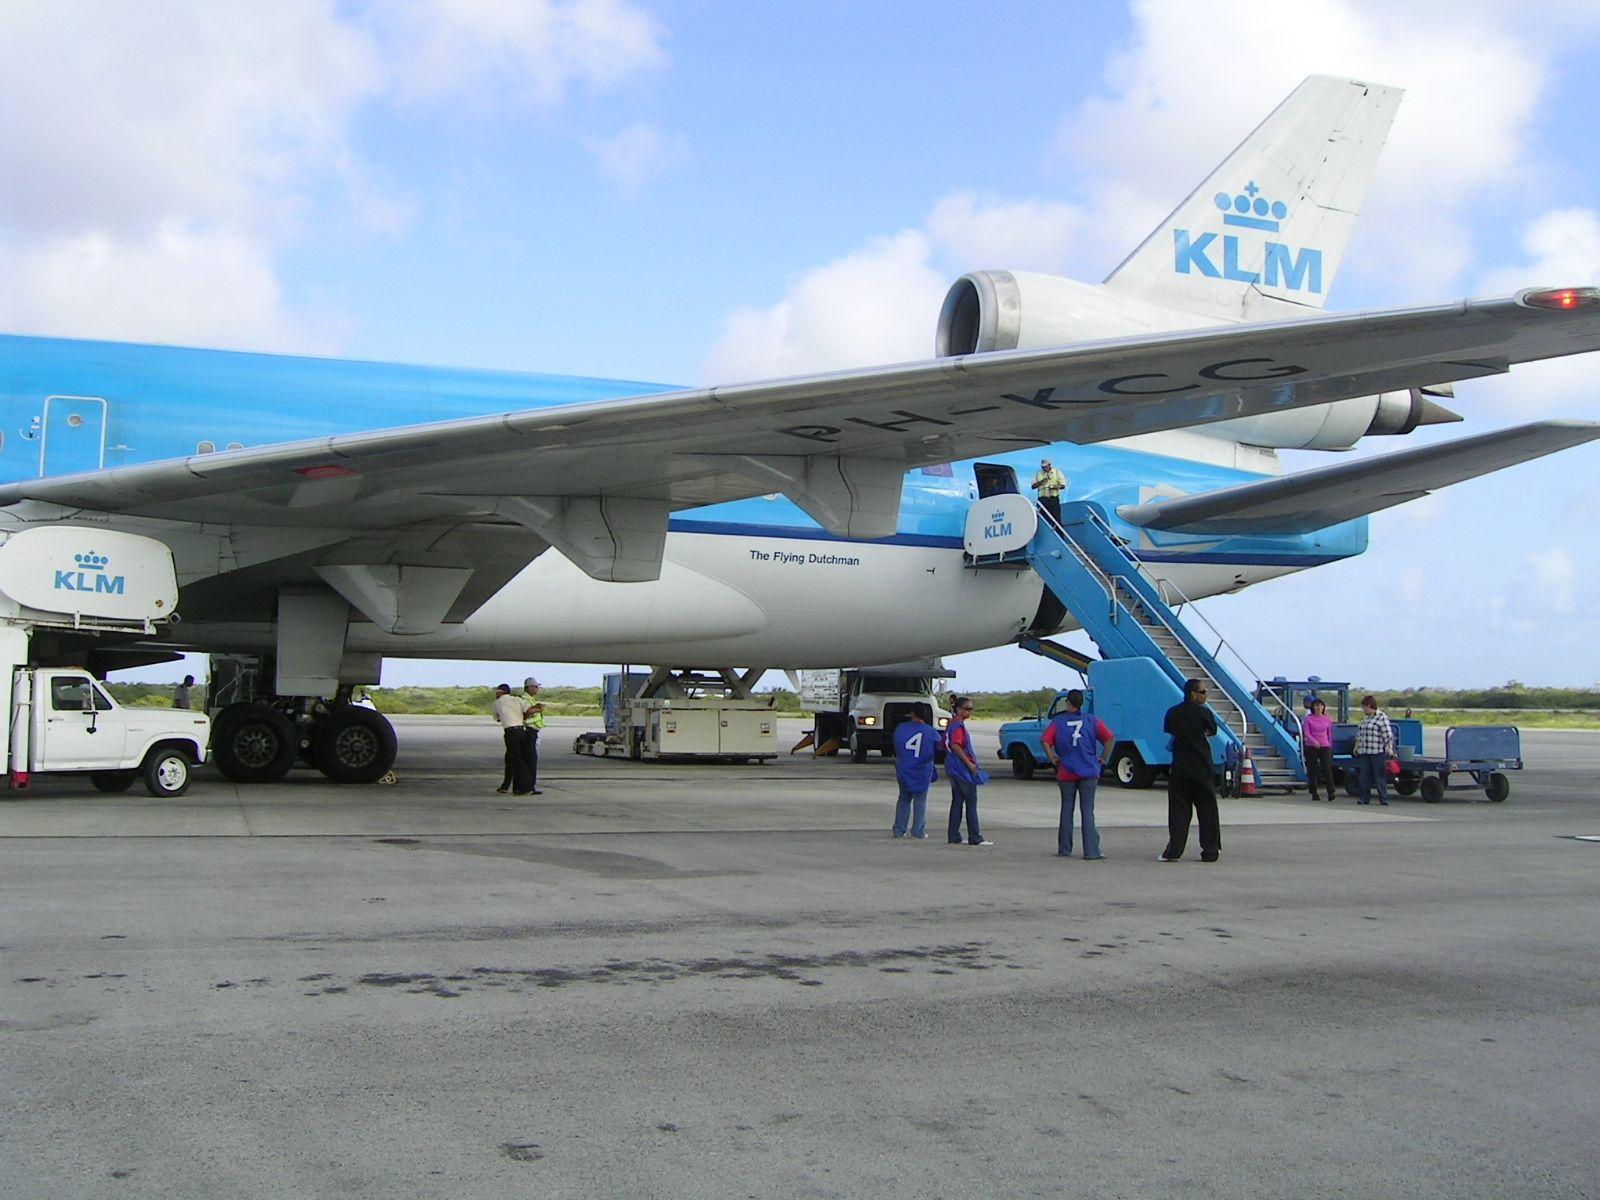 Aeroporto Havana Arrivi : How to get from havana airport to city center cuba day